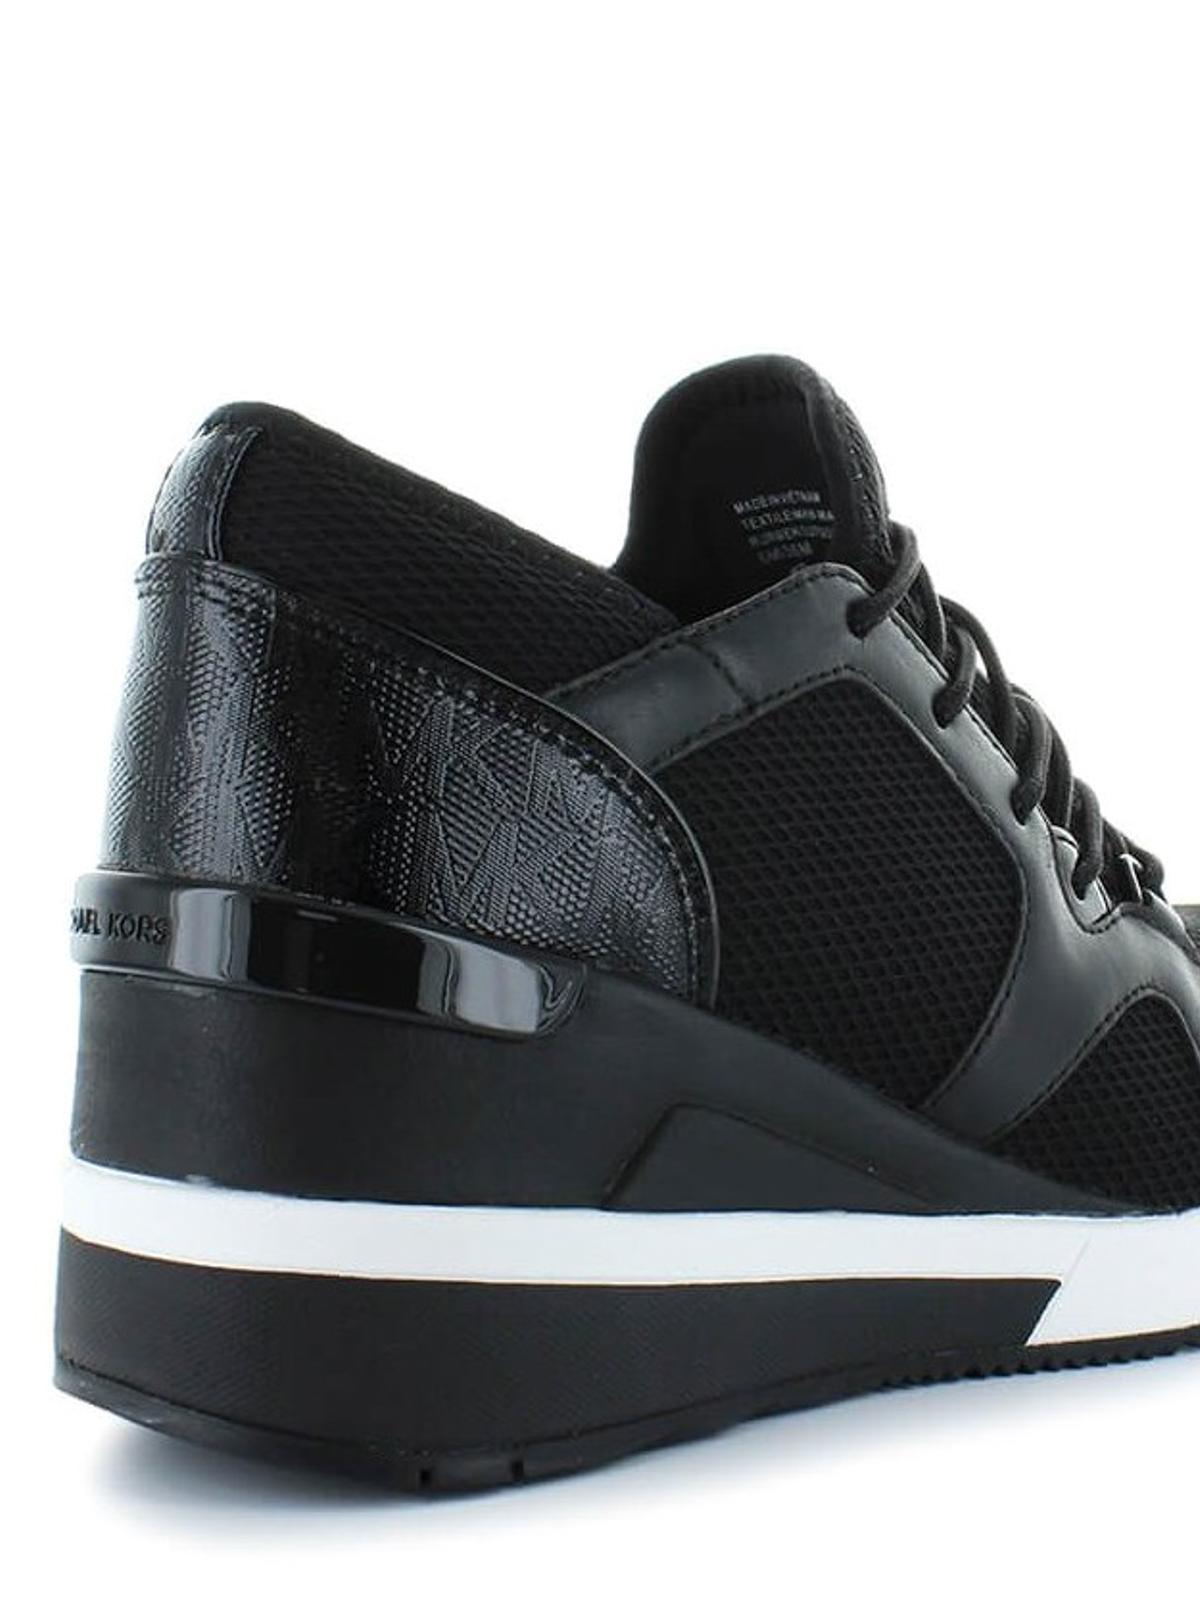 michael kors sneaker schwarz sneaker 43t8scfs1d001. Black Bedroom Furniture Sets. Home Design Ideas